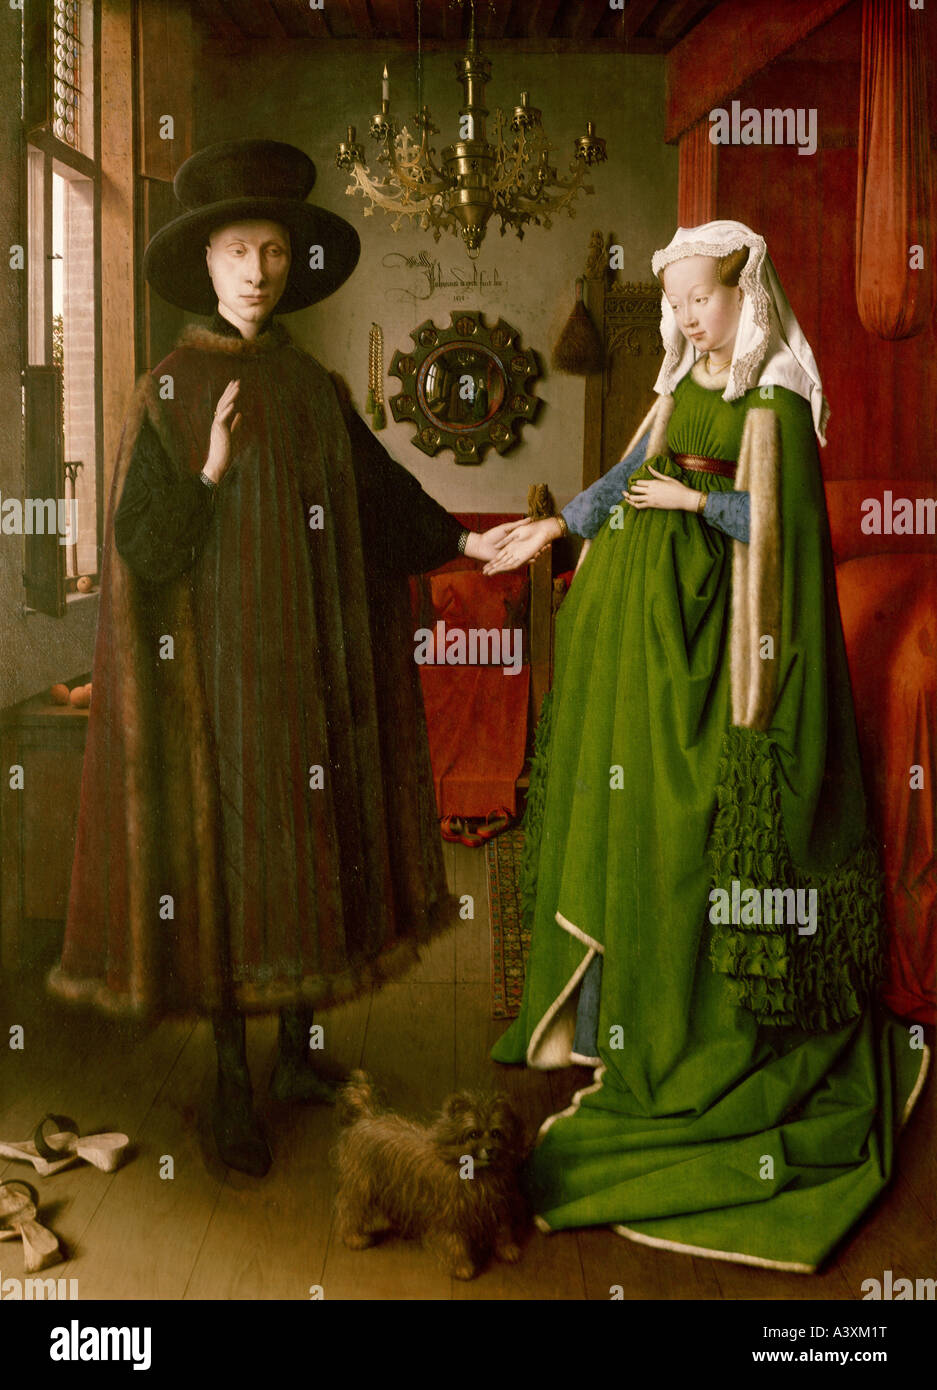 """Belas Artes, Eyck, Jan van, (circa 1390 - 1441), pintura, ""casamento"", 1434 Arnolfini, óleo Imagens de Stock"